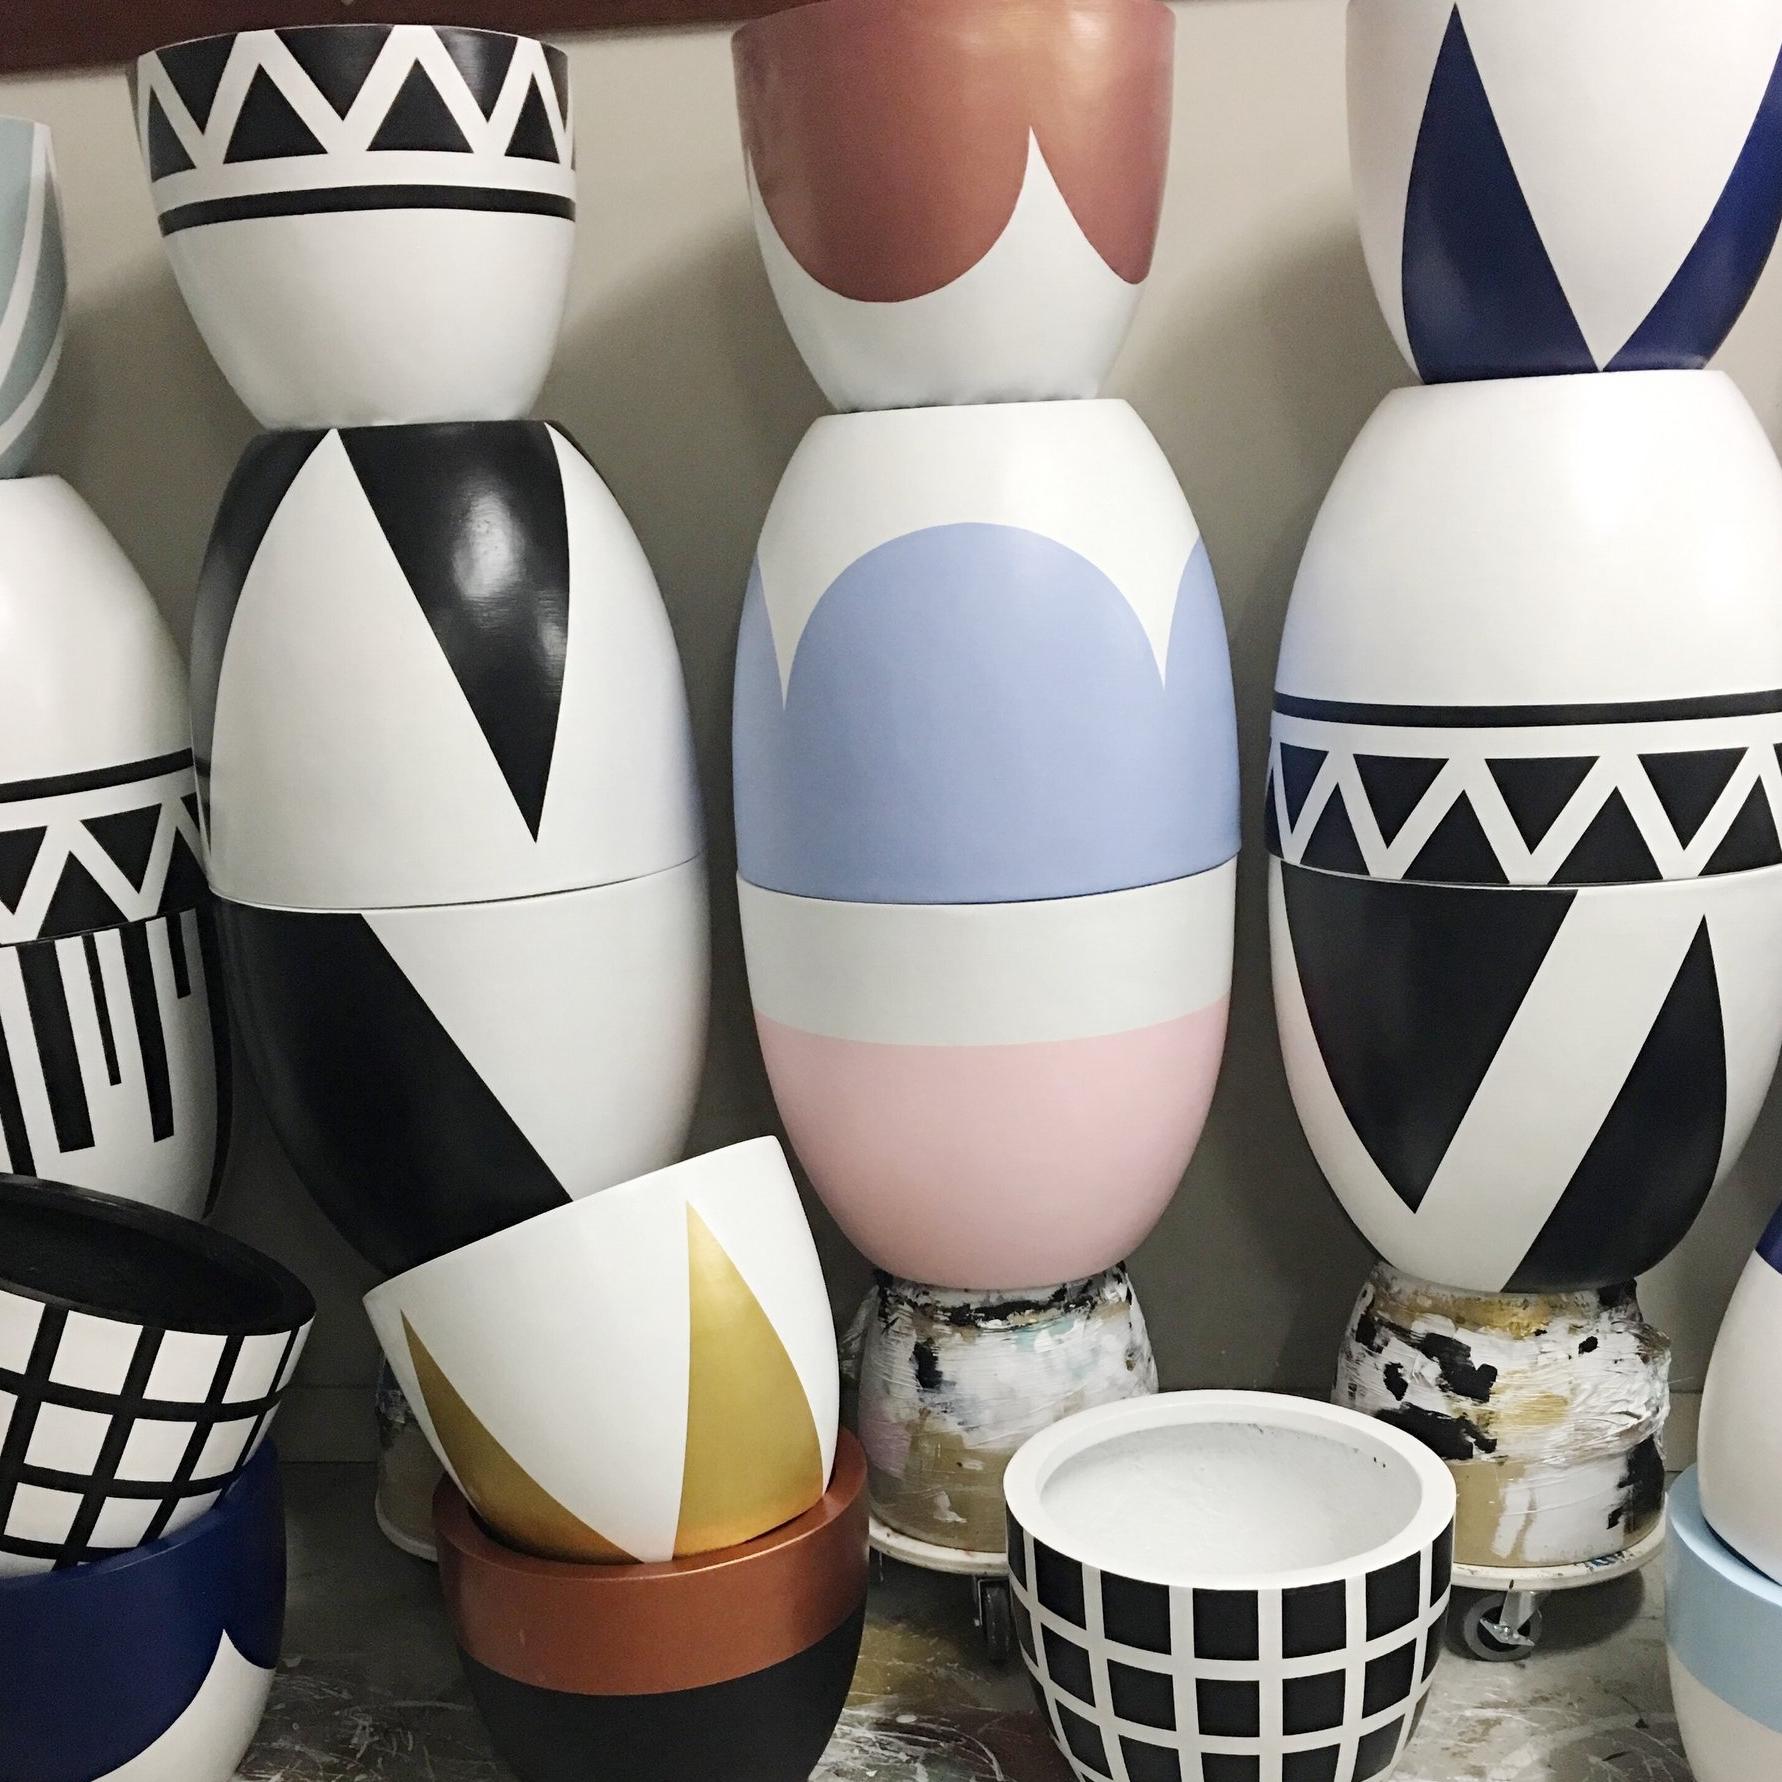 Pots and pots and pots and pots.jpg